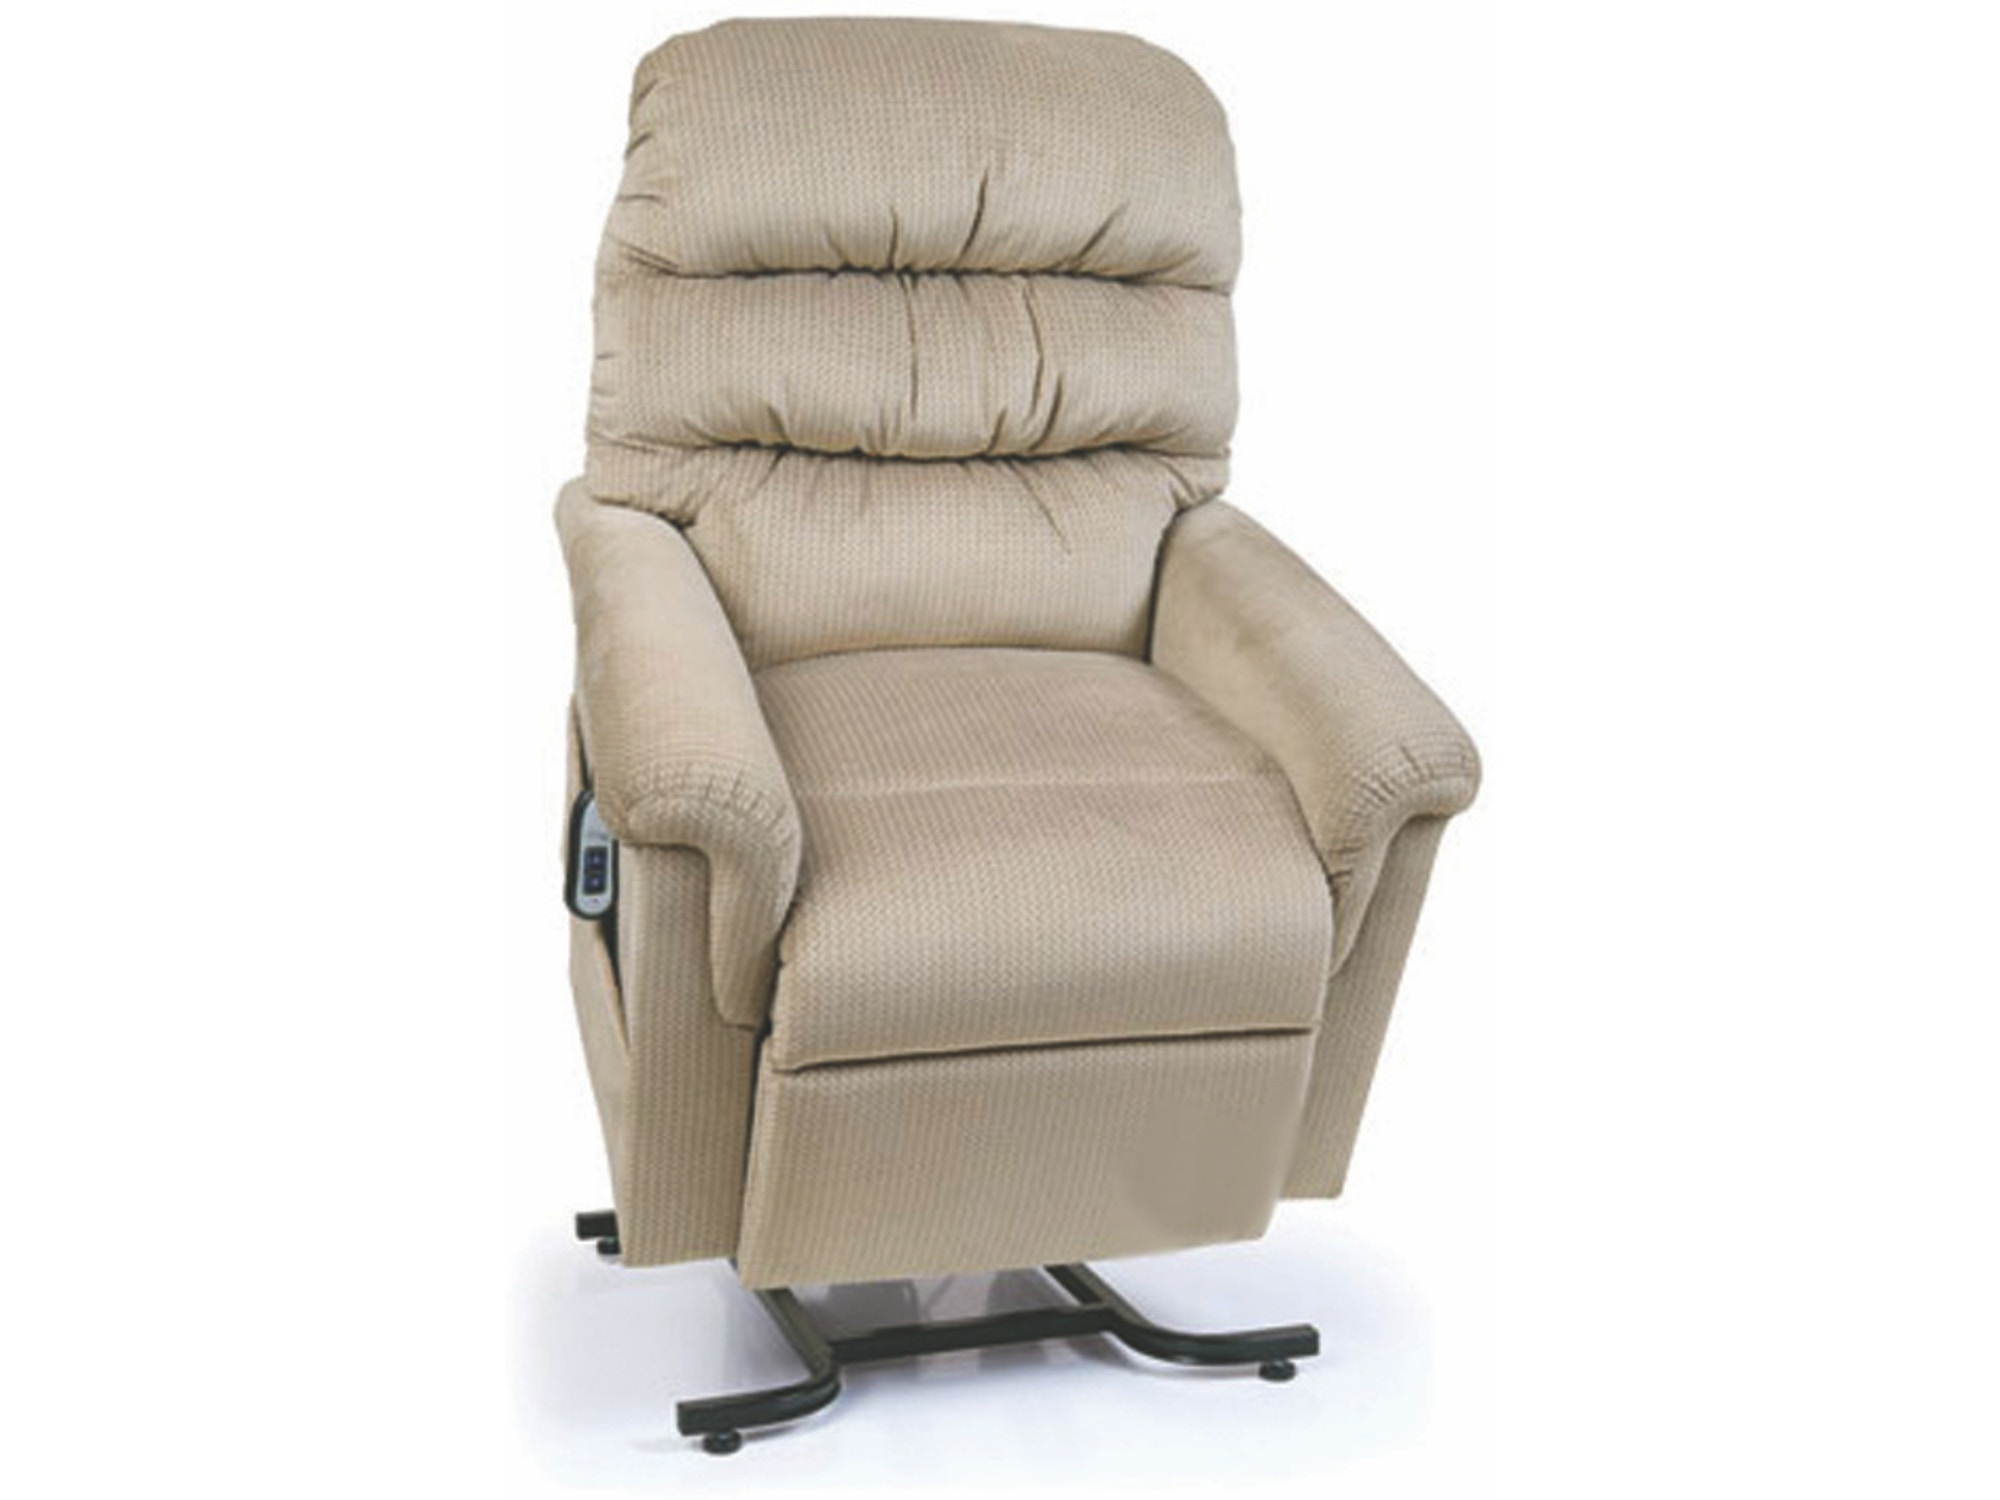 Ultra Comfort Living Room Chairs - Furniture Fair - Cincinnati ...